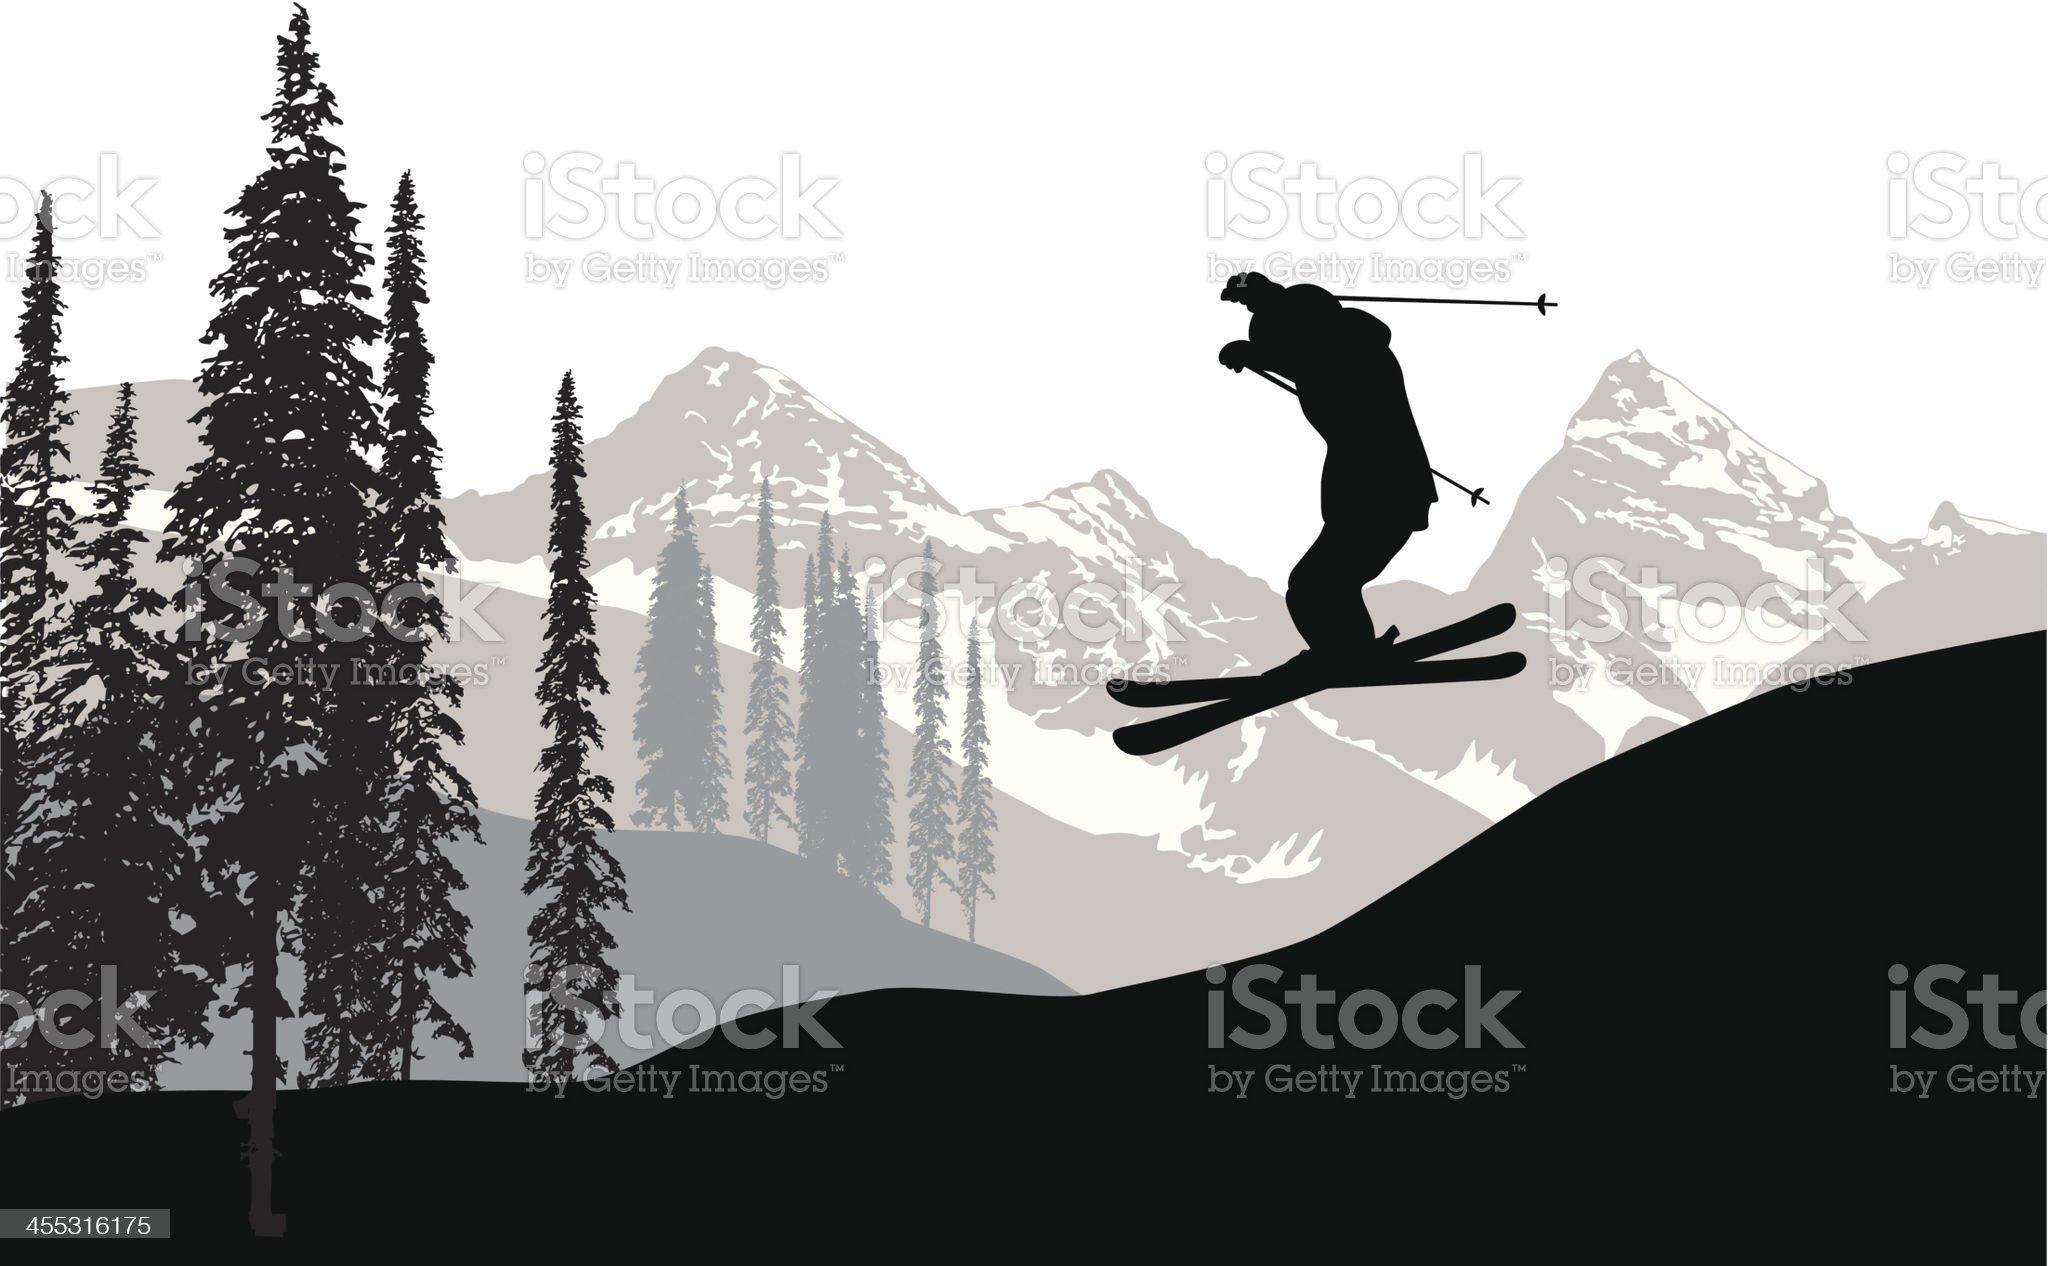 Sky Skiing Vector Silhouette royalty-free stock vector art